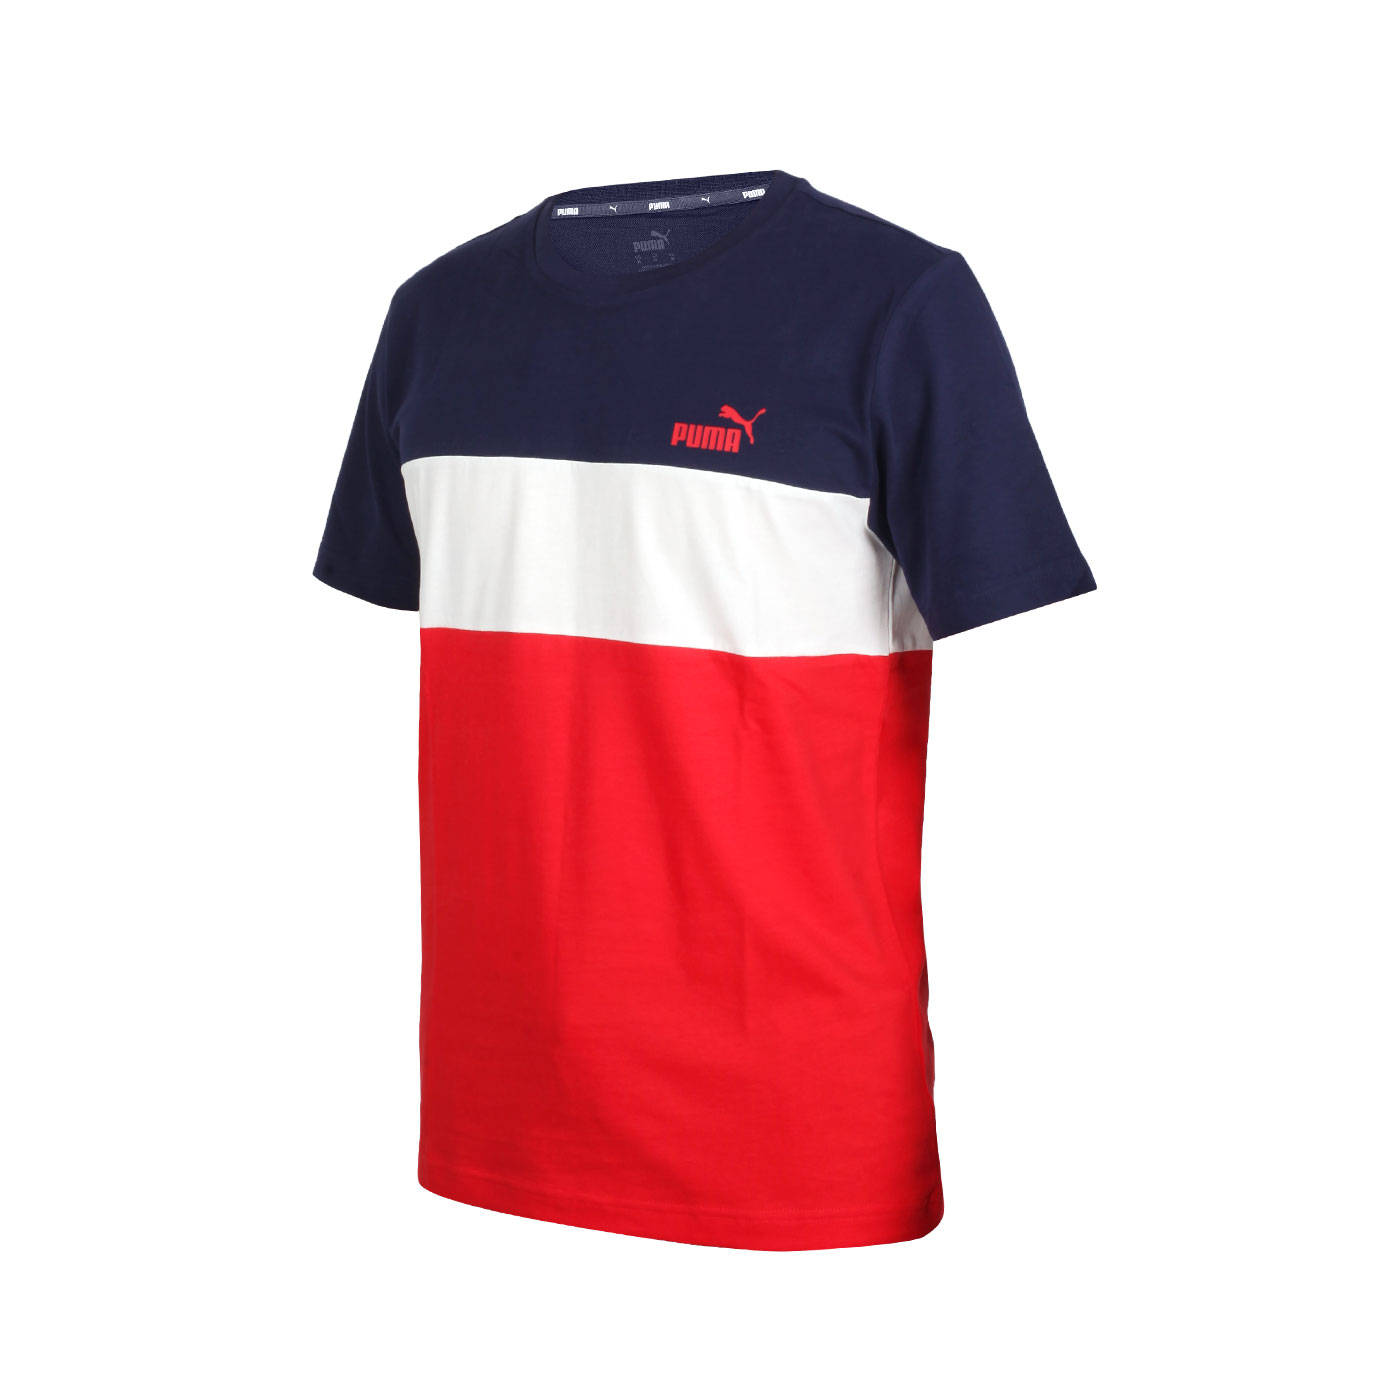 PUMA 男款基本系列短袖T恤 58715906